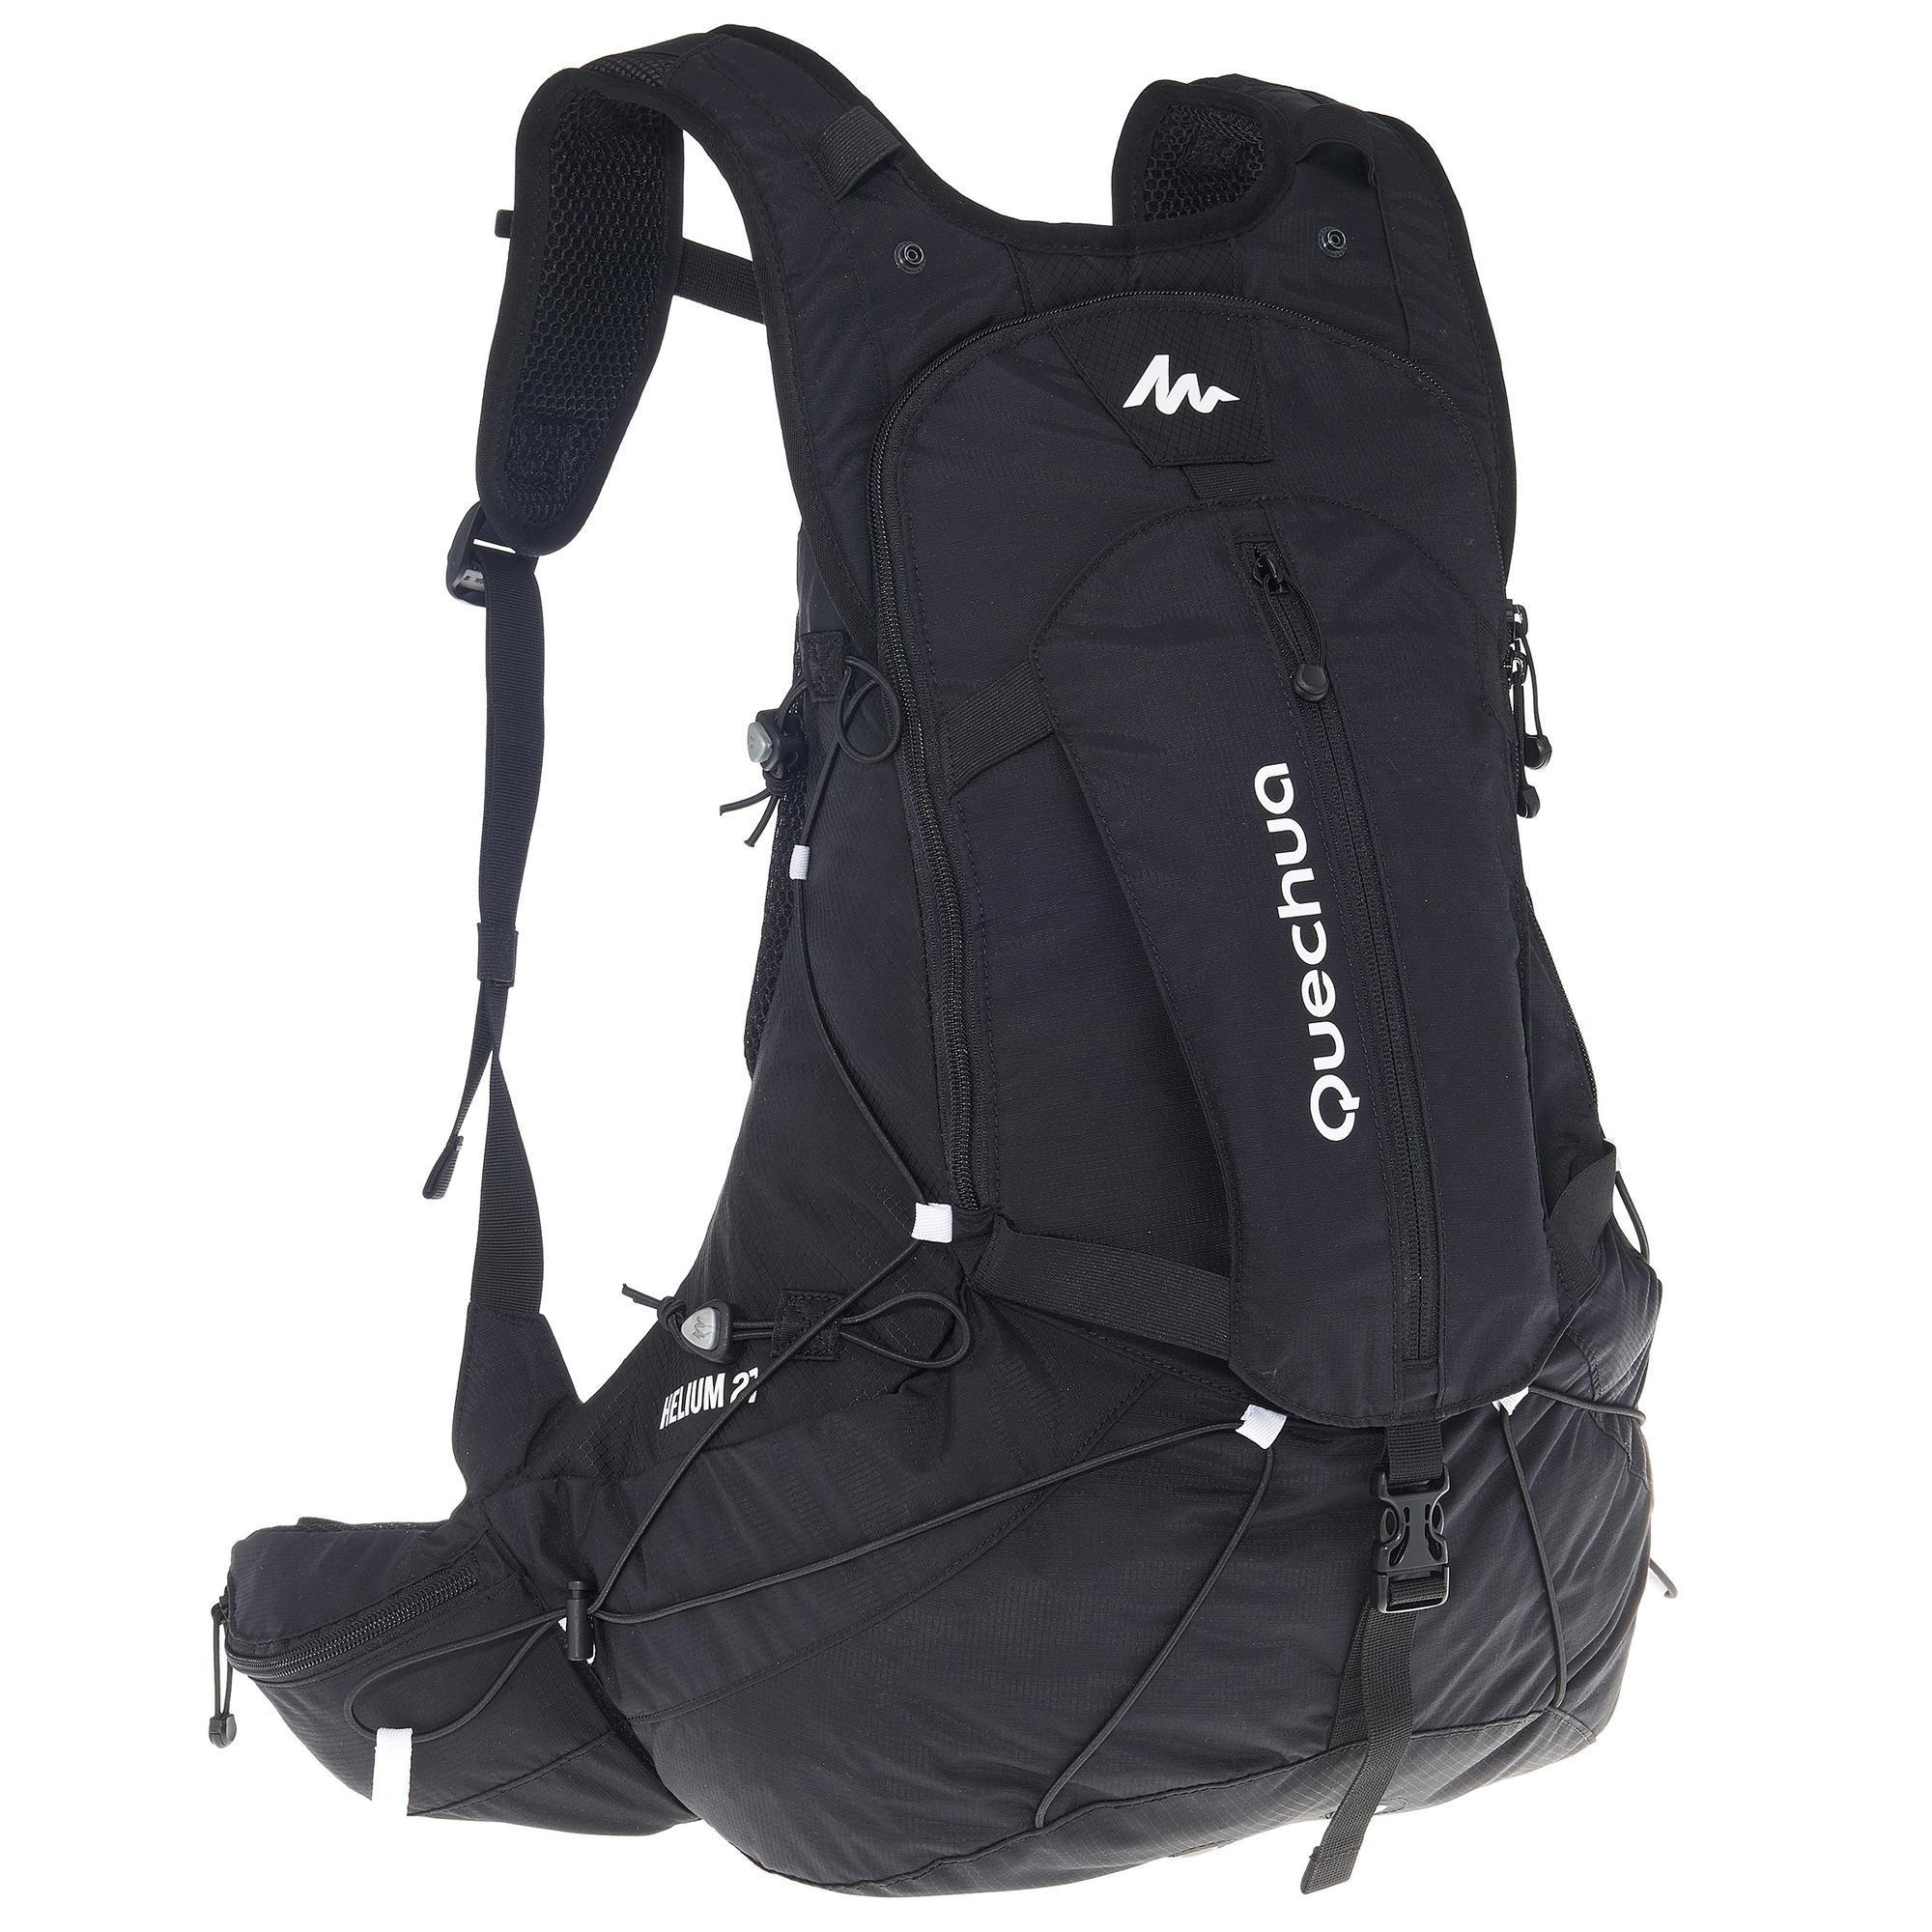 83a30b02d61 ▷ Hiking rugzak kopen? | Online Internetwinkel